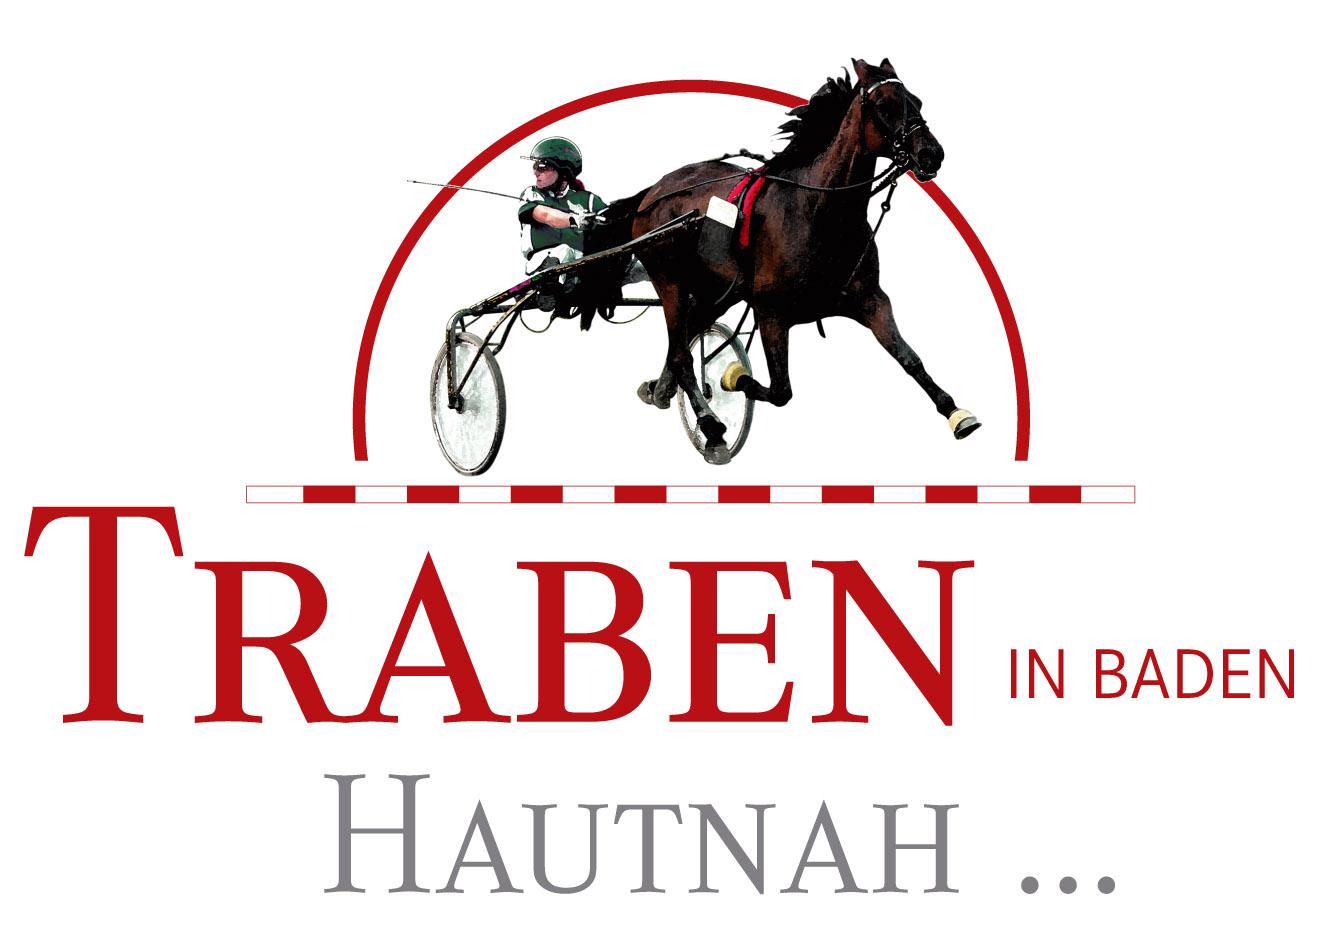 Traben in Baden - hautnah